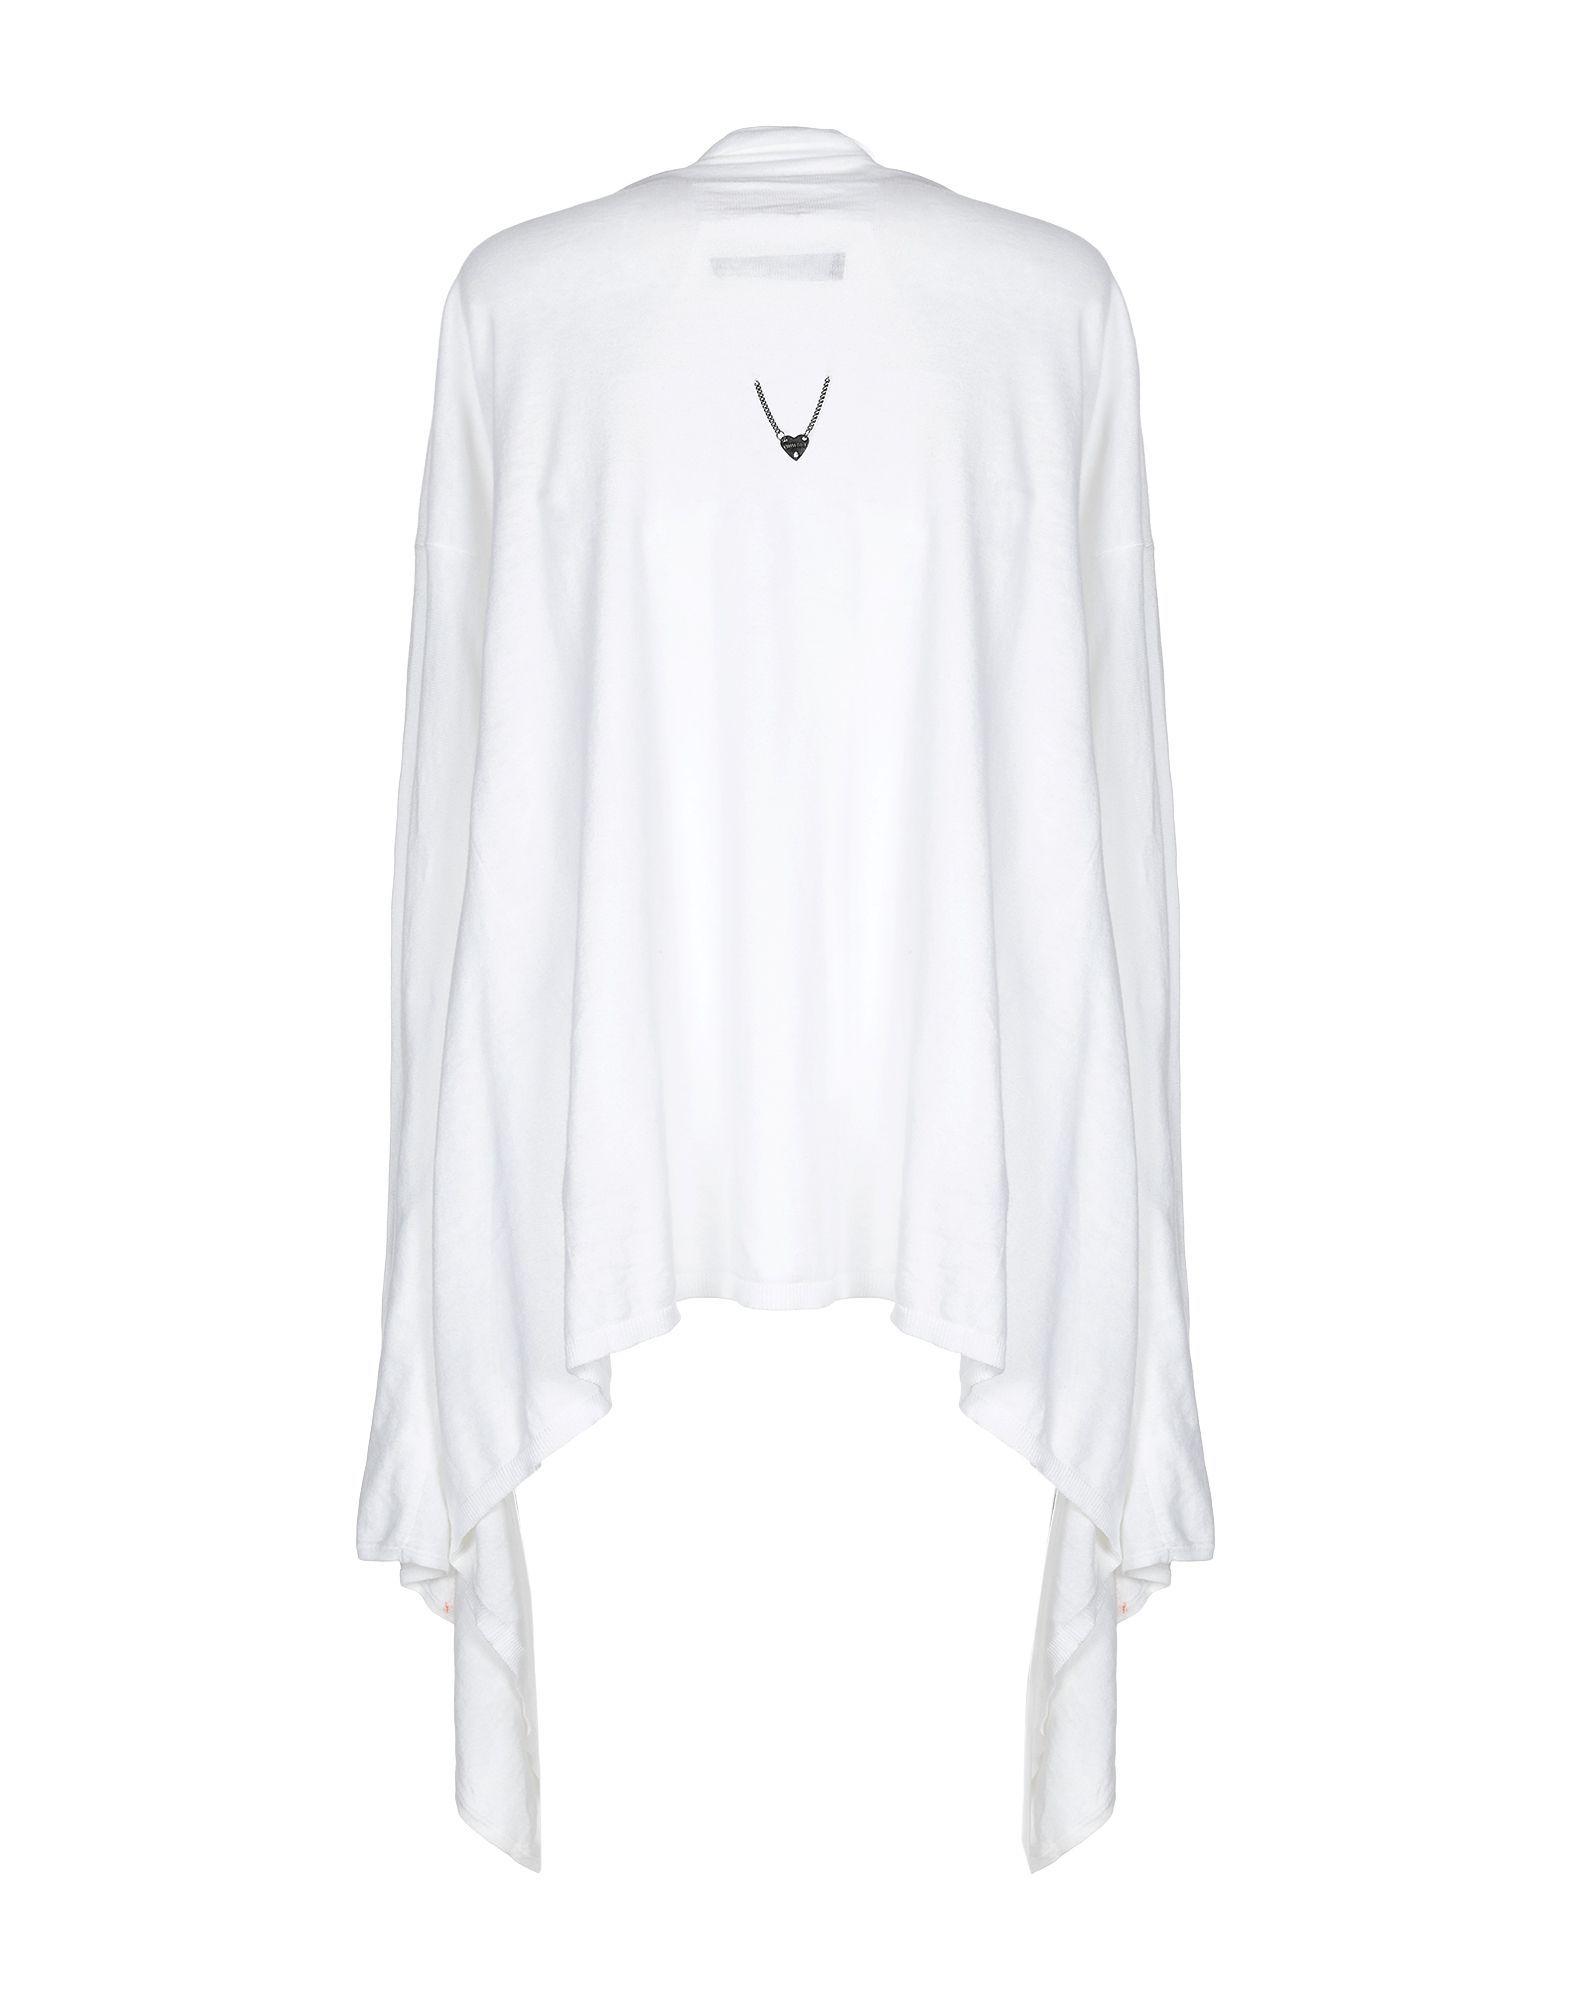 Twinset White Cotton Knit